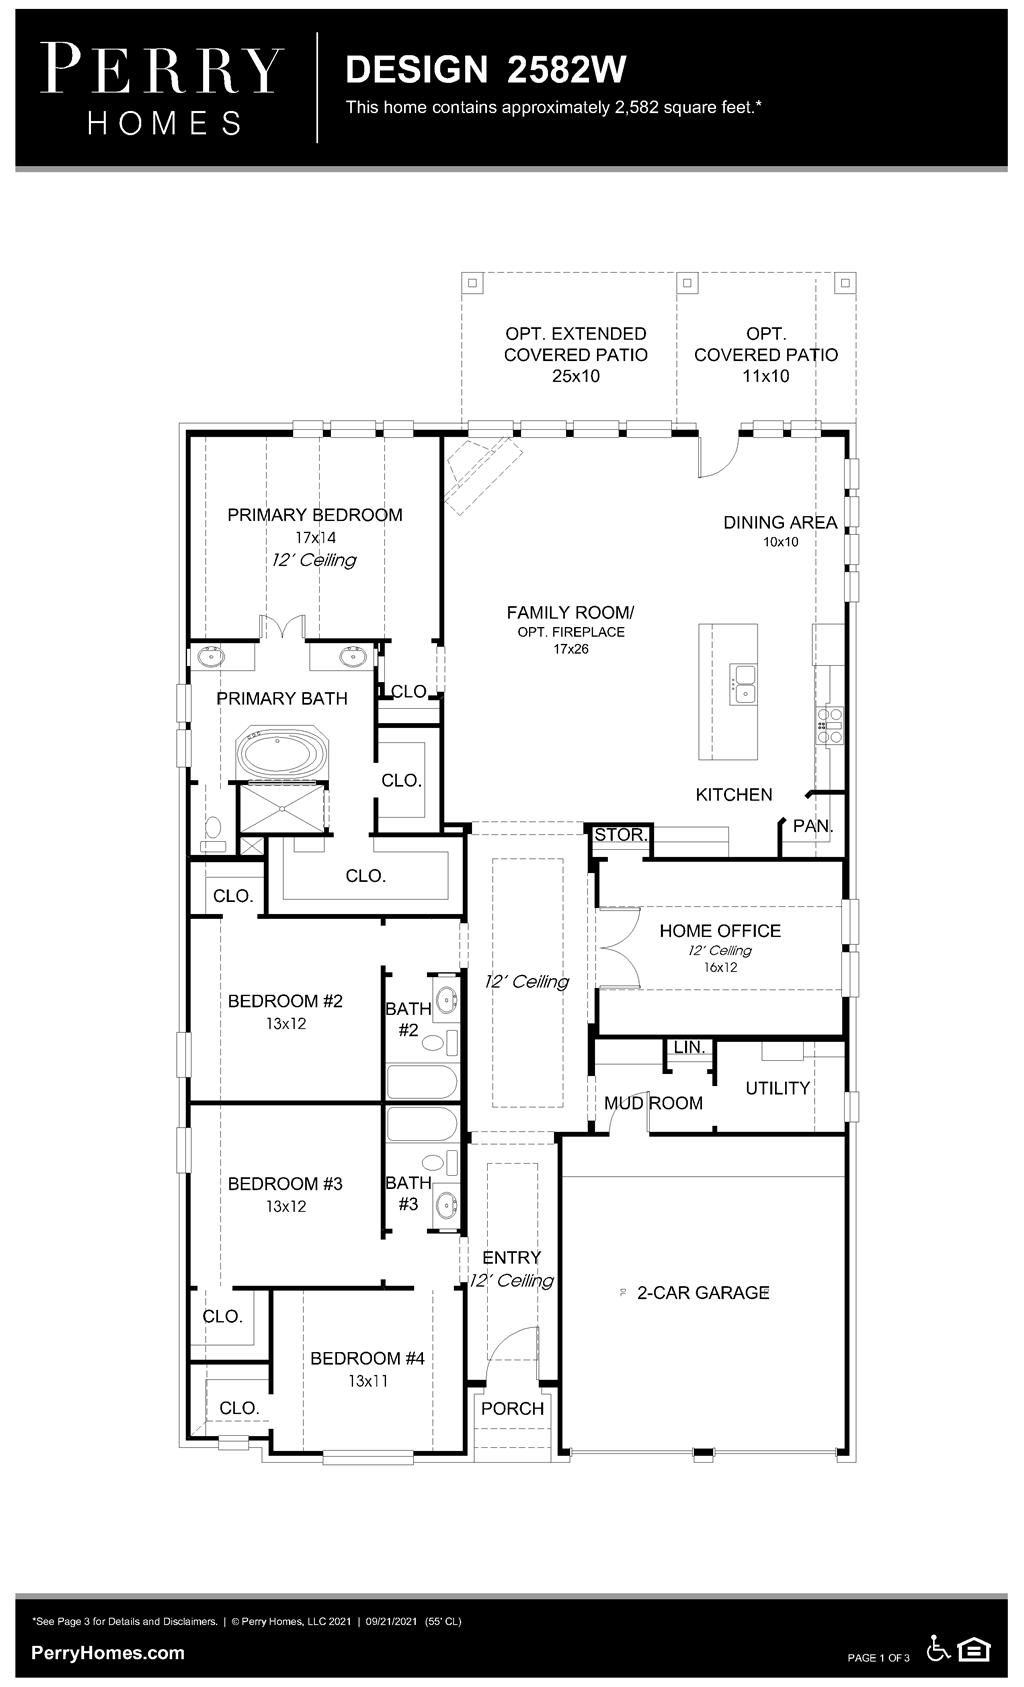 Floor Plan for 2582W